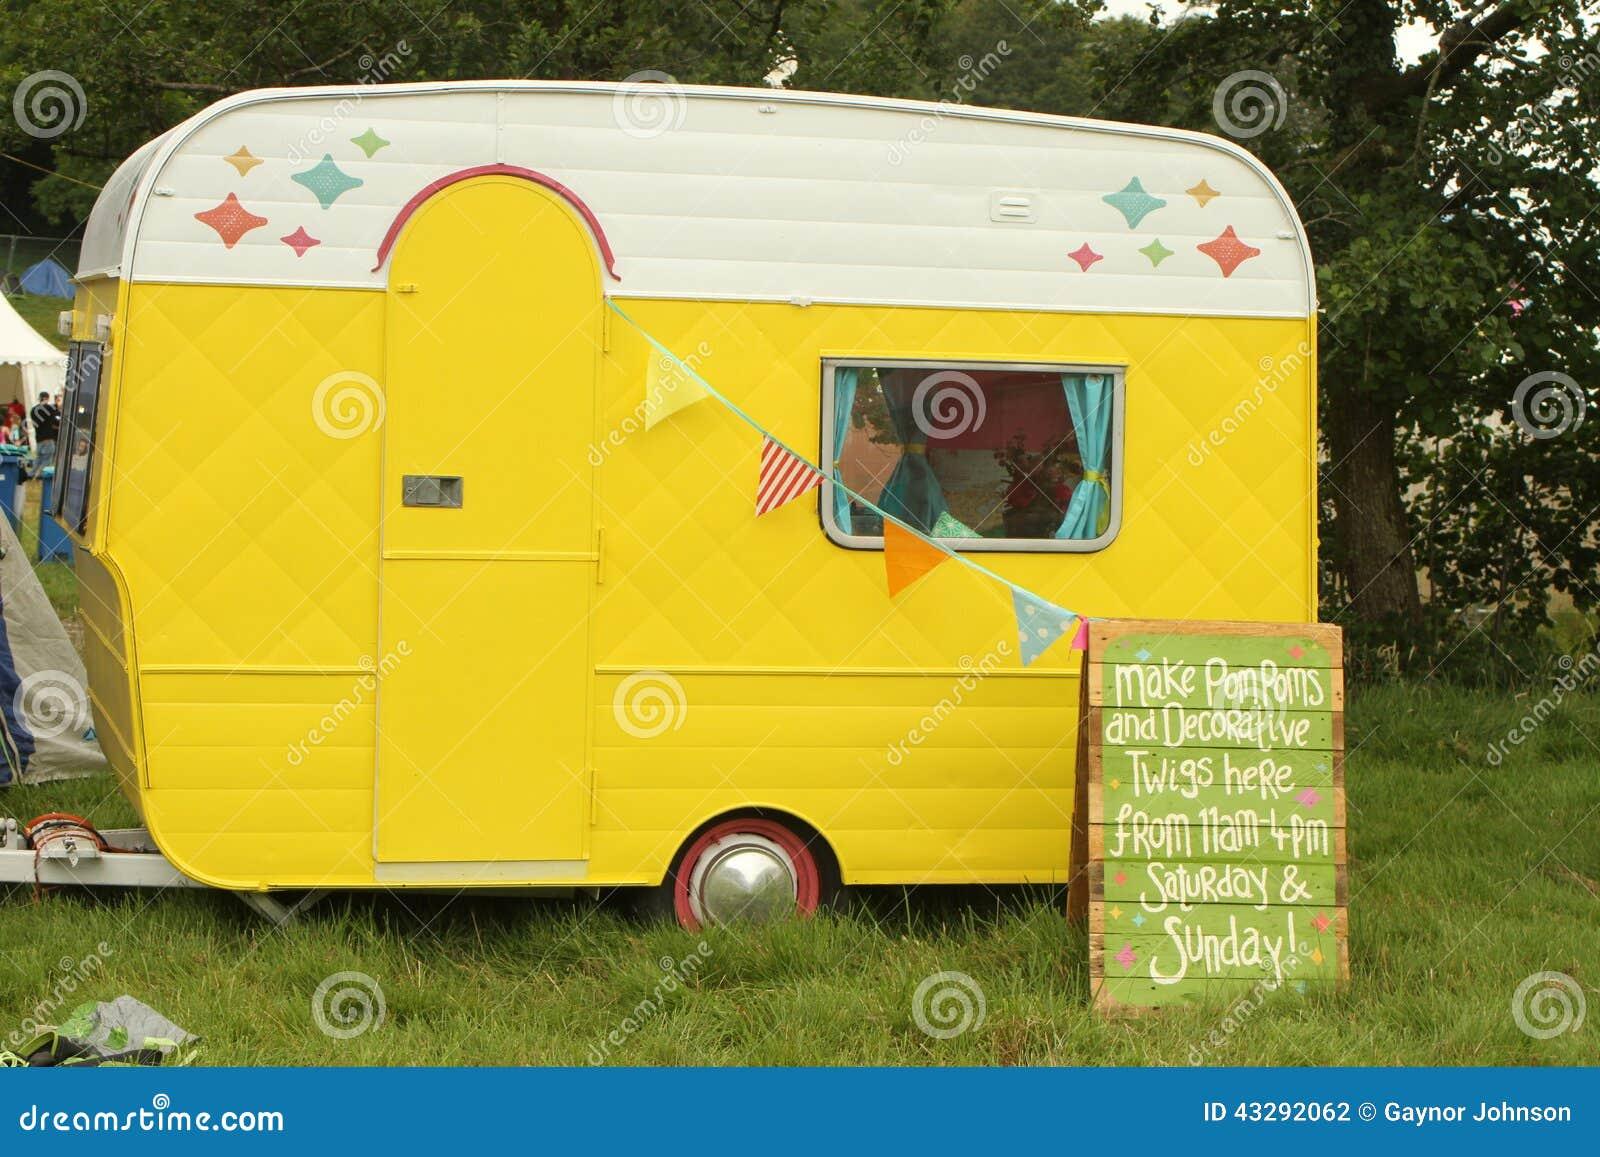 sweet little caravan editorial photography image 43292062. Black Bedroom Furniture Sets. Home Design Ideas